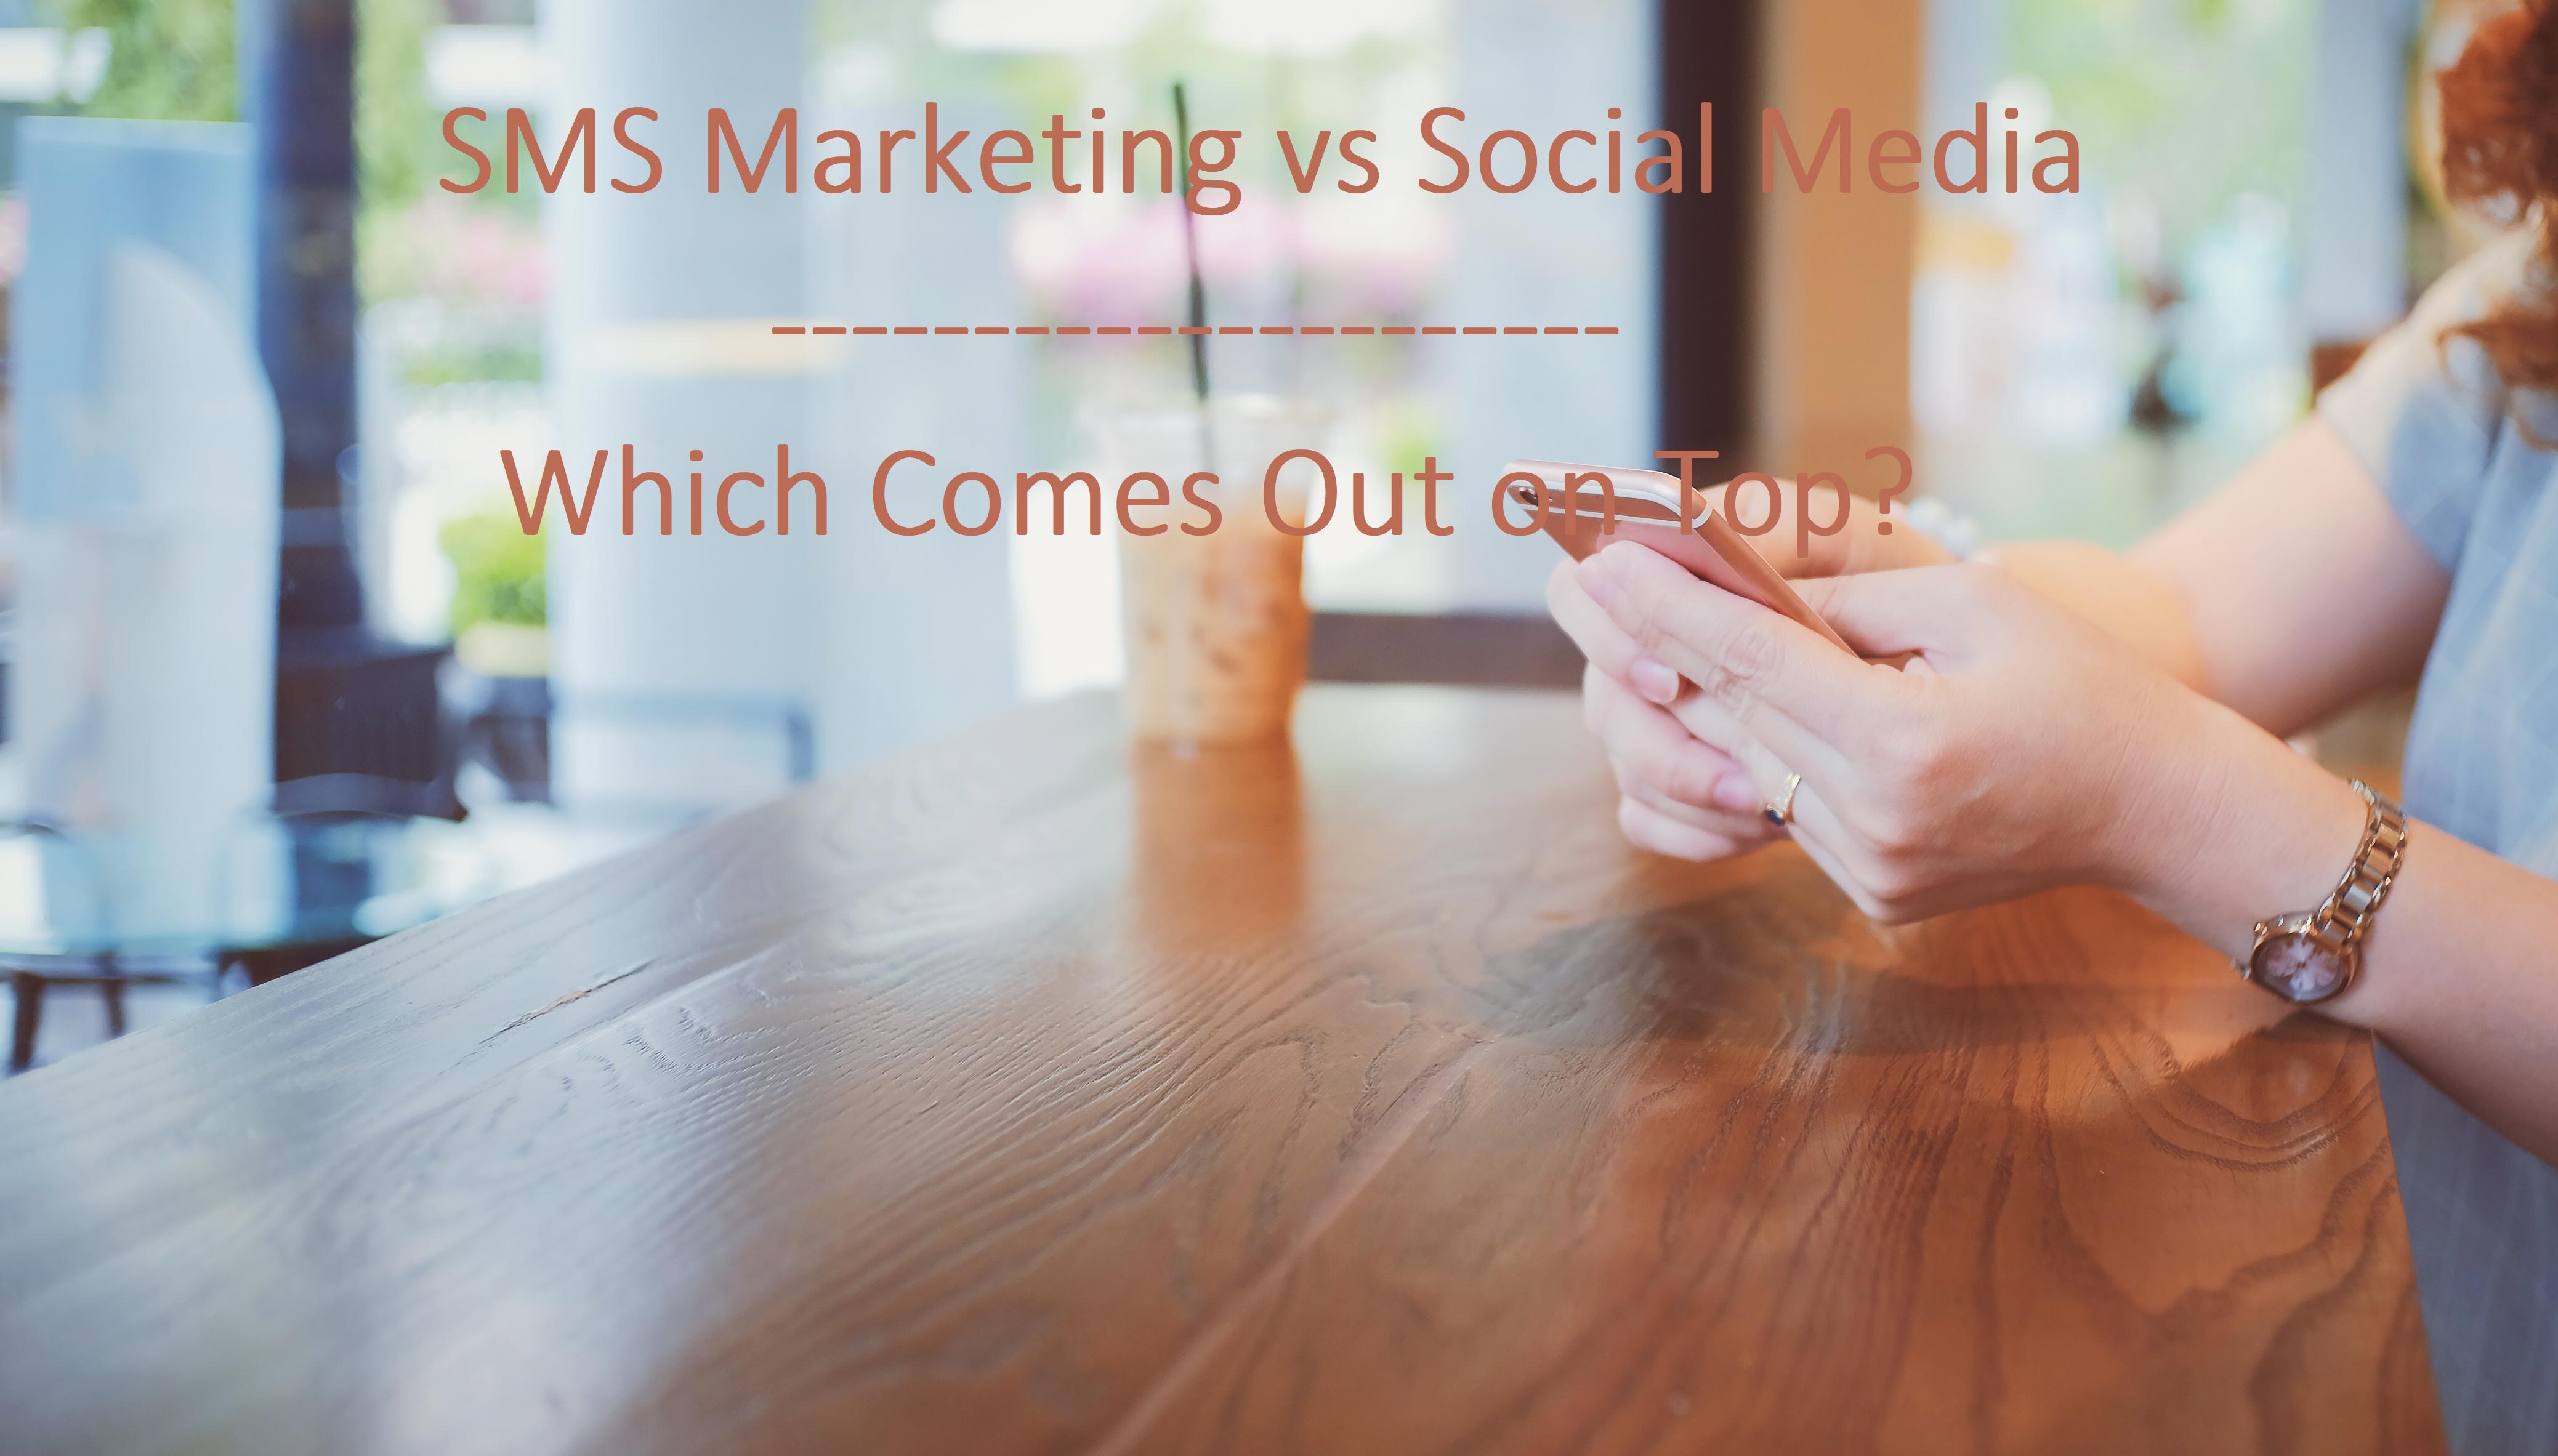 sms-marketing-vs-social-media-1